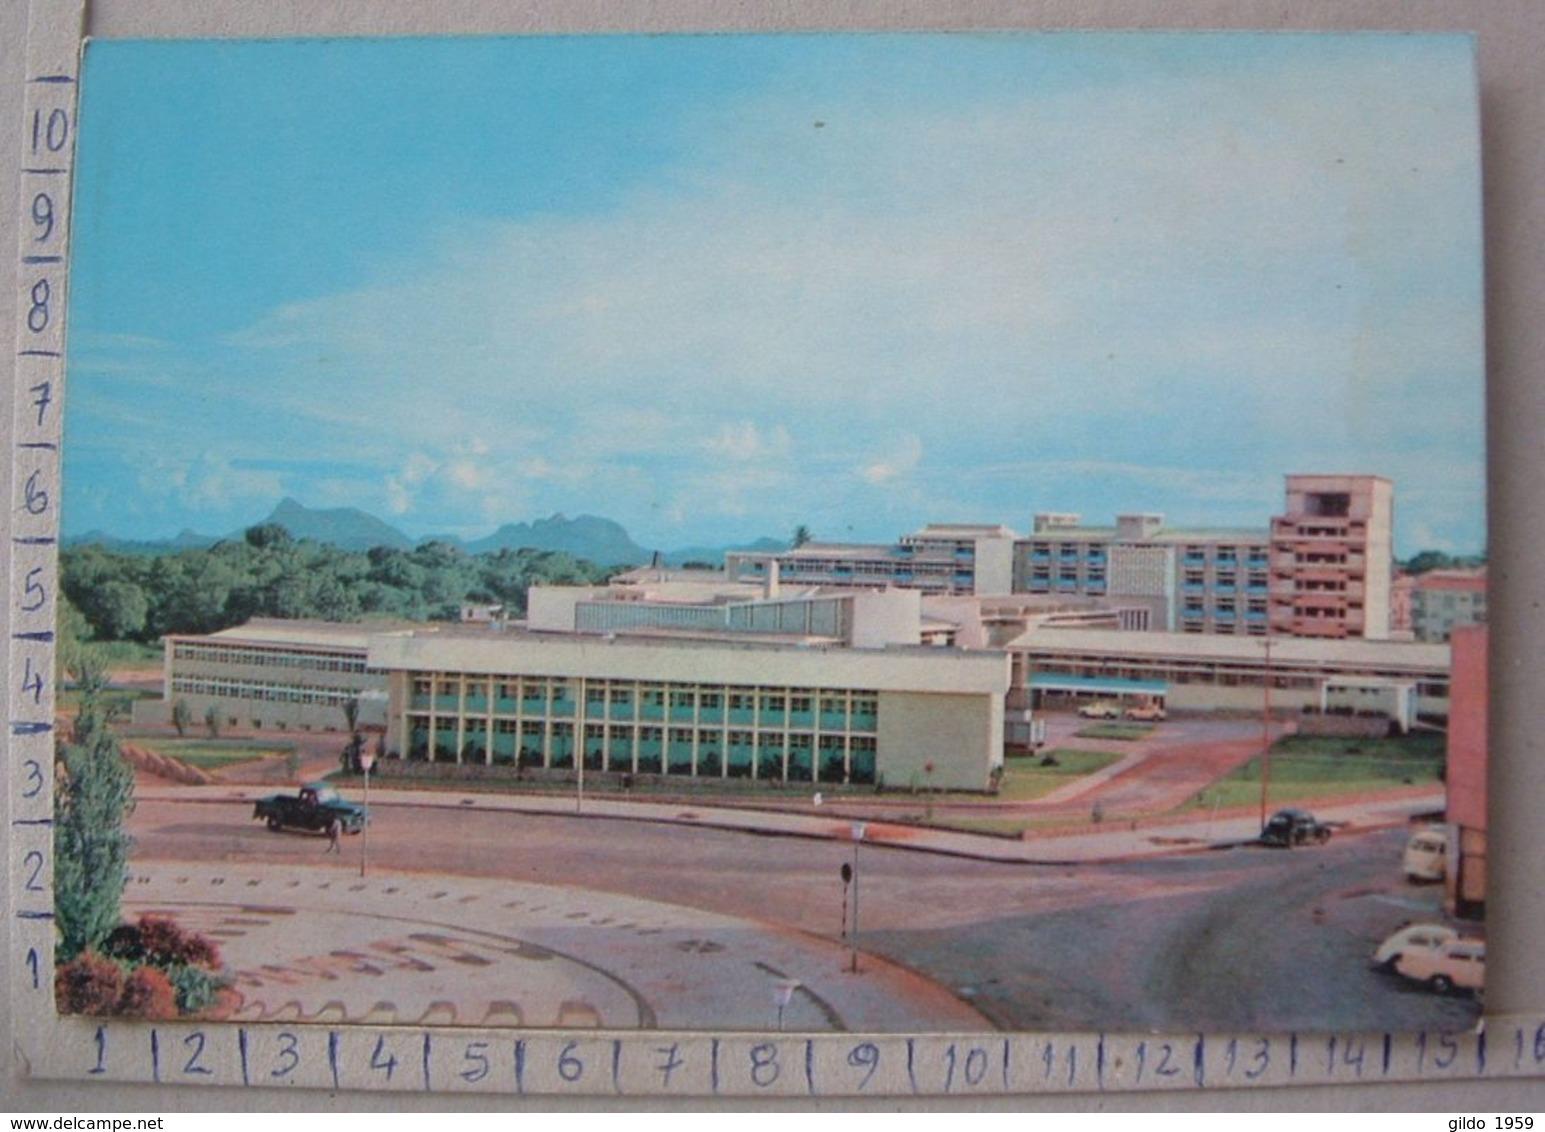 Moçambique - Nampula - Hospital Egas Miniz - SP1987 - Mozambique